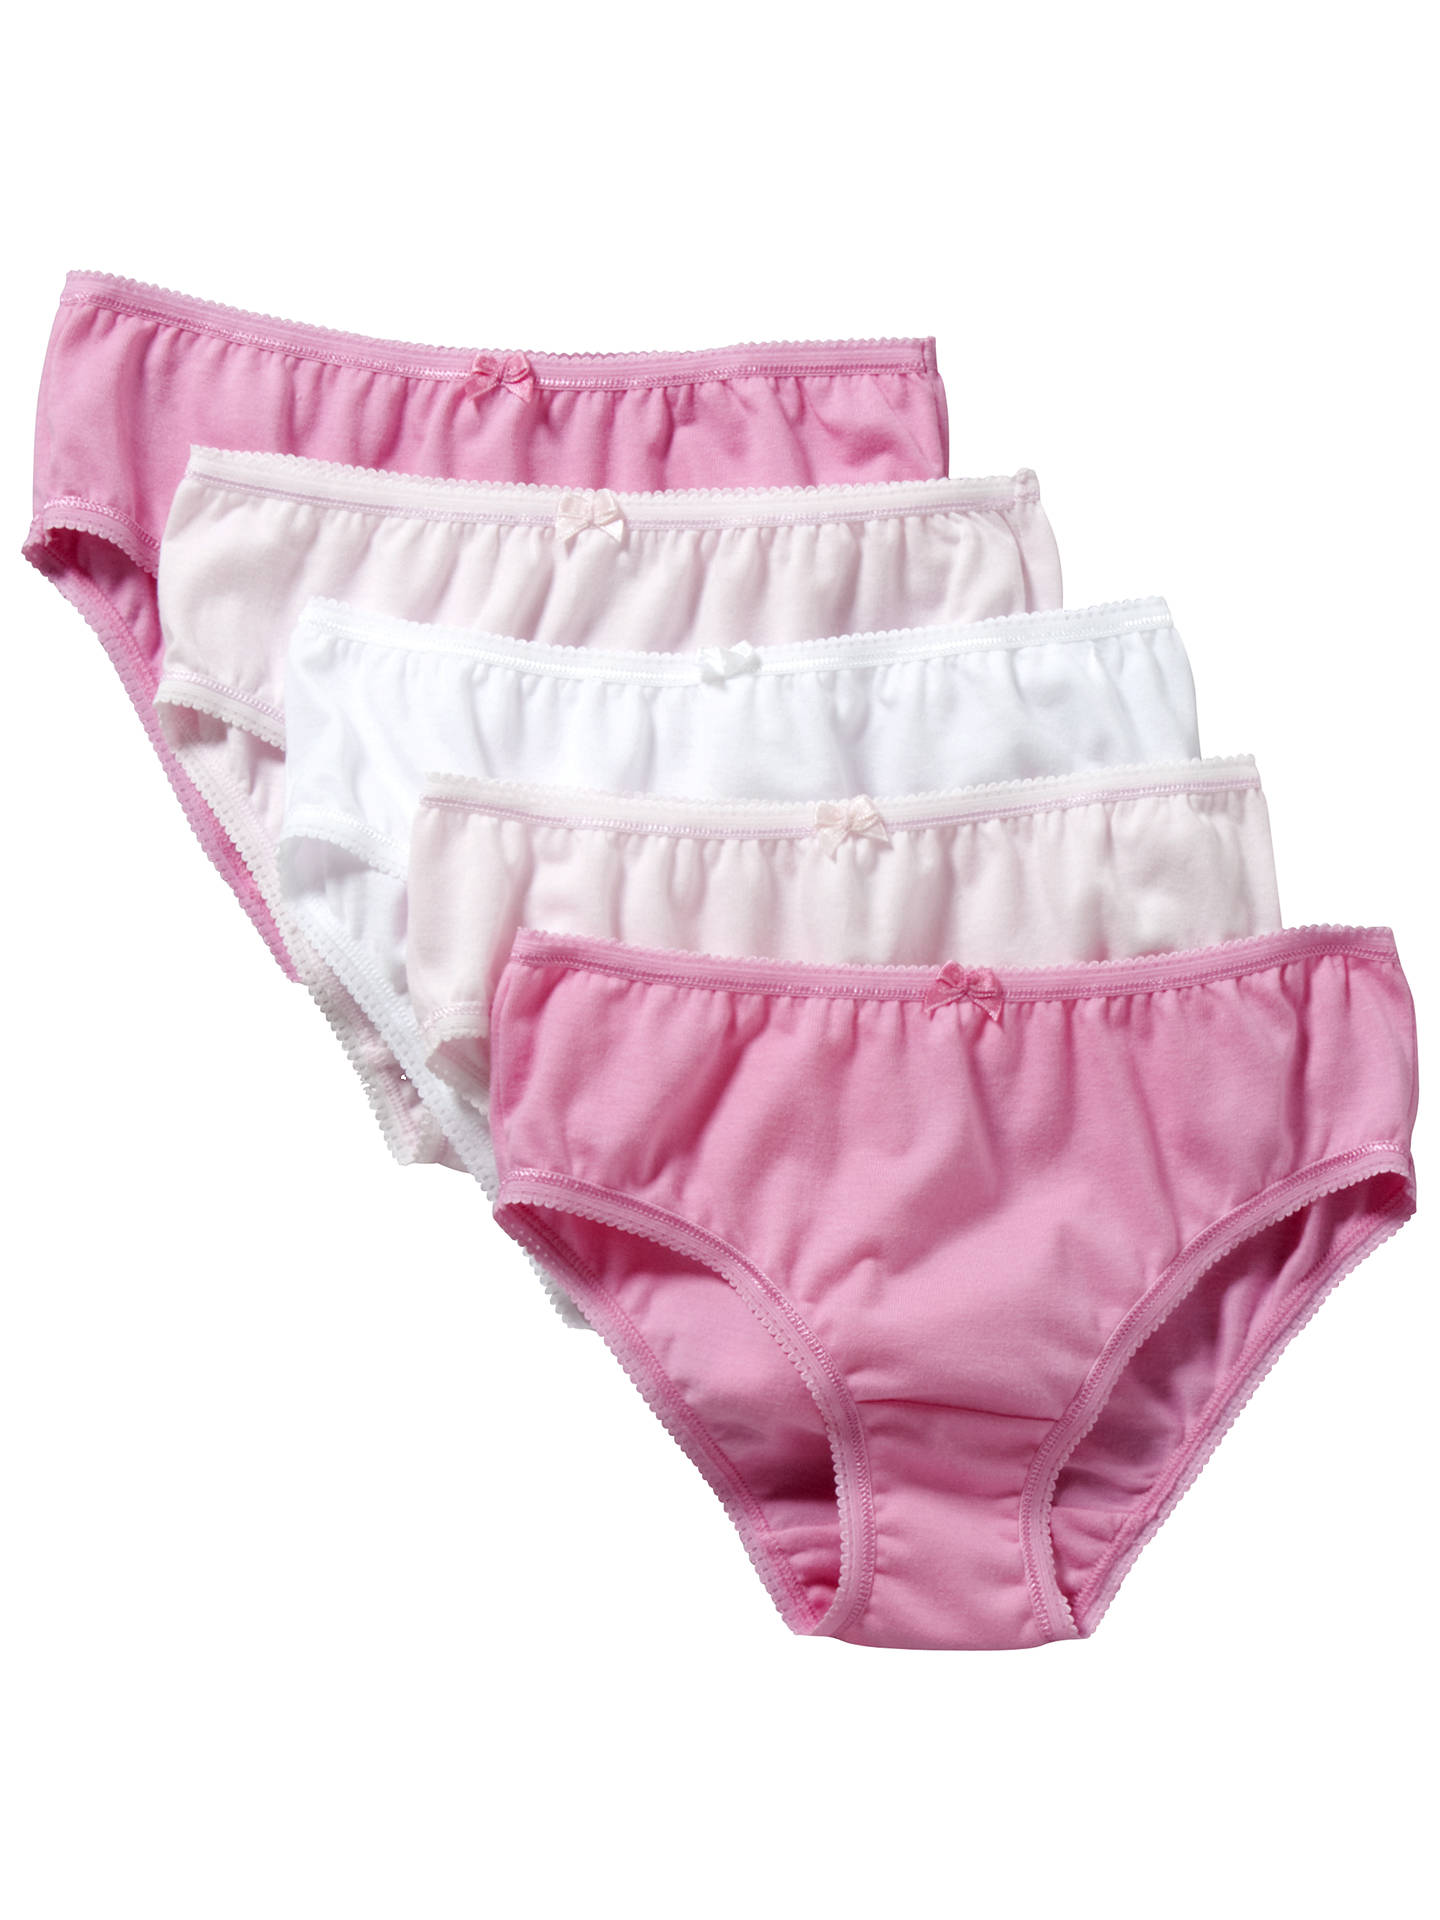 7724ba3dae1f John Lewis & Partners Girls' Briefs, Pack of 5, Pink at John Lewis ...